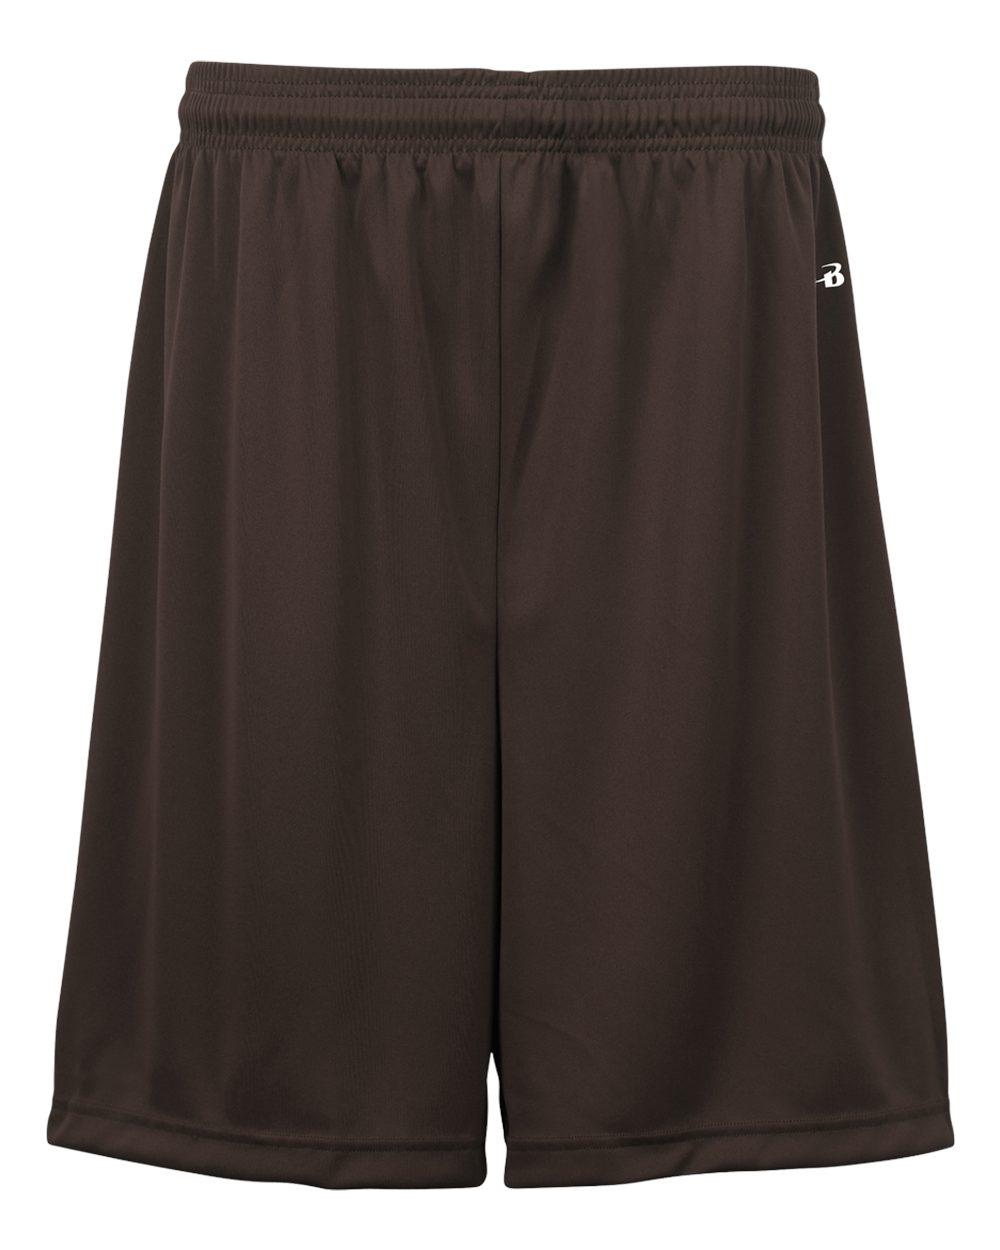 B-Core 9 Inch Short - Brown